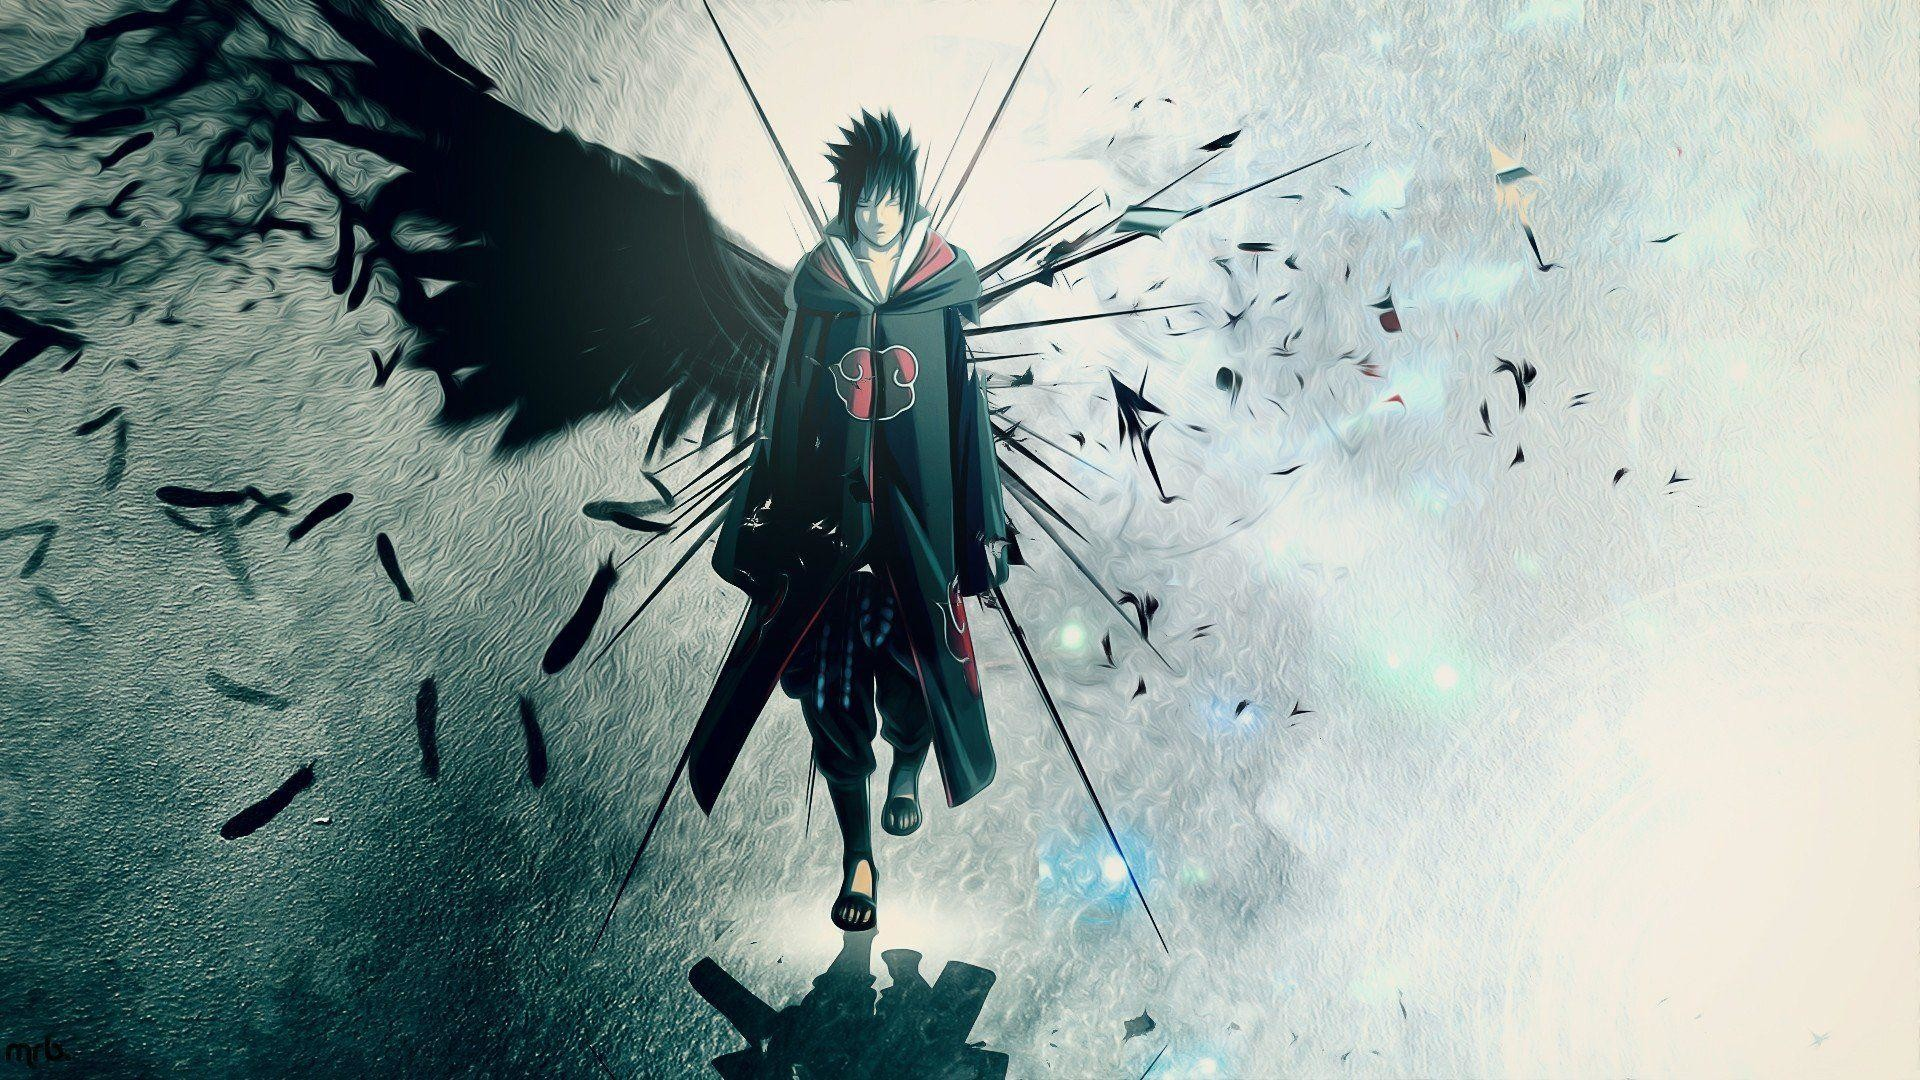 wallpaper.wiki-Photos-HD-Epic-Anime-Download-PIC-